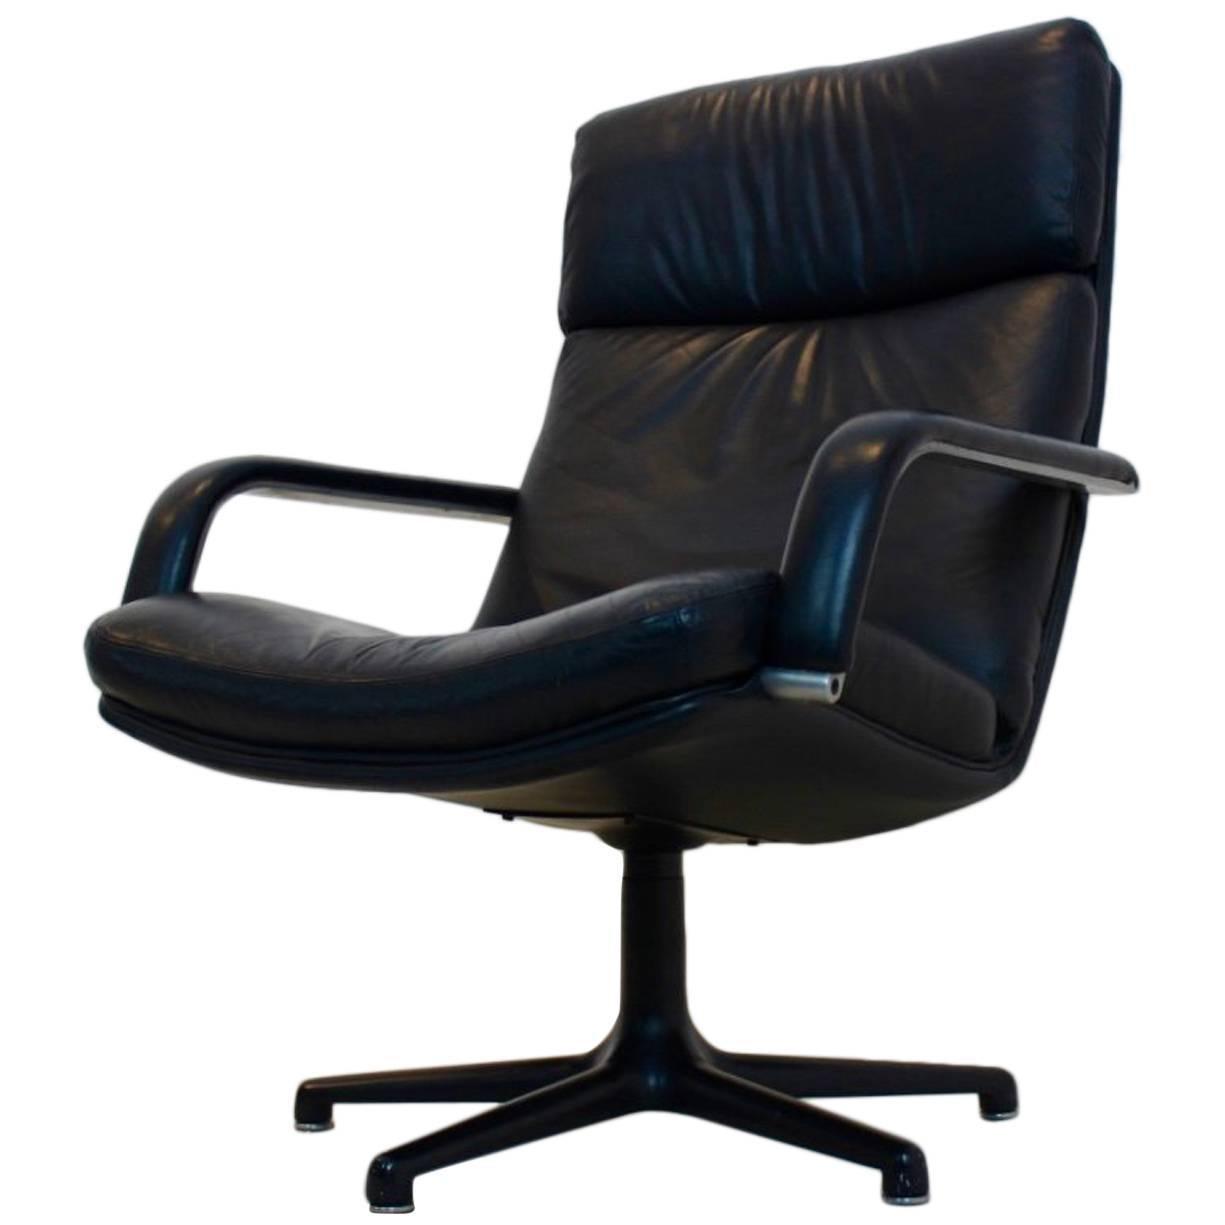 Perfect Original Artifort Swivel Lounge Chair F141 by Geoffrey Harcourt